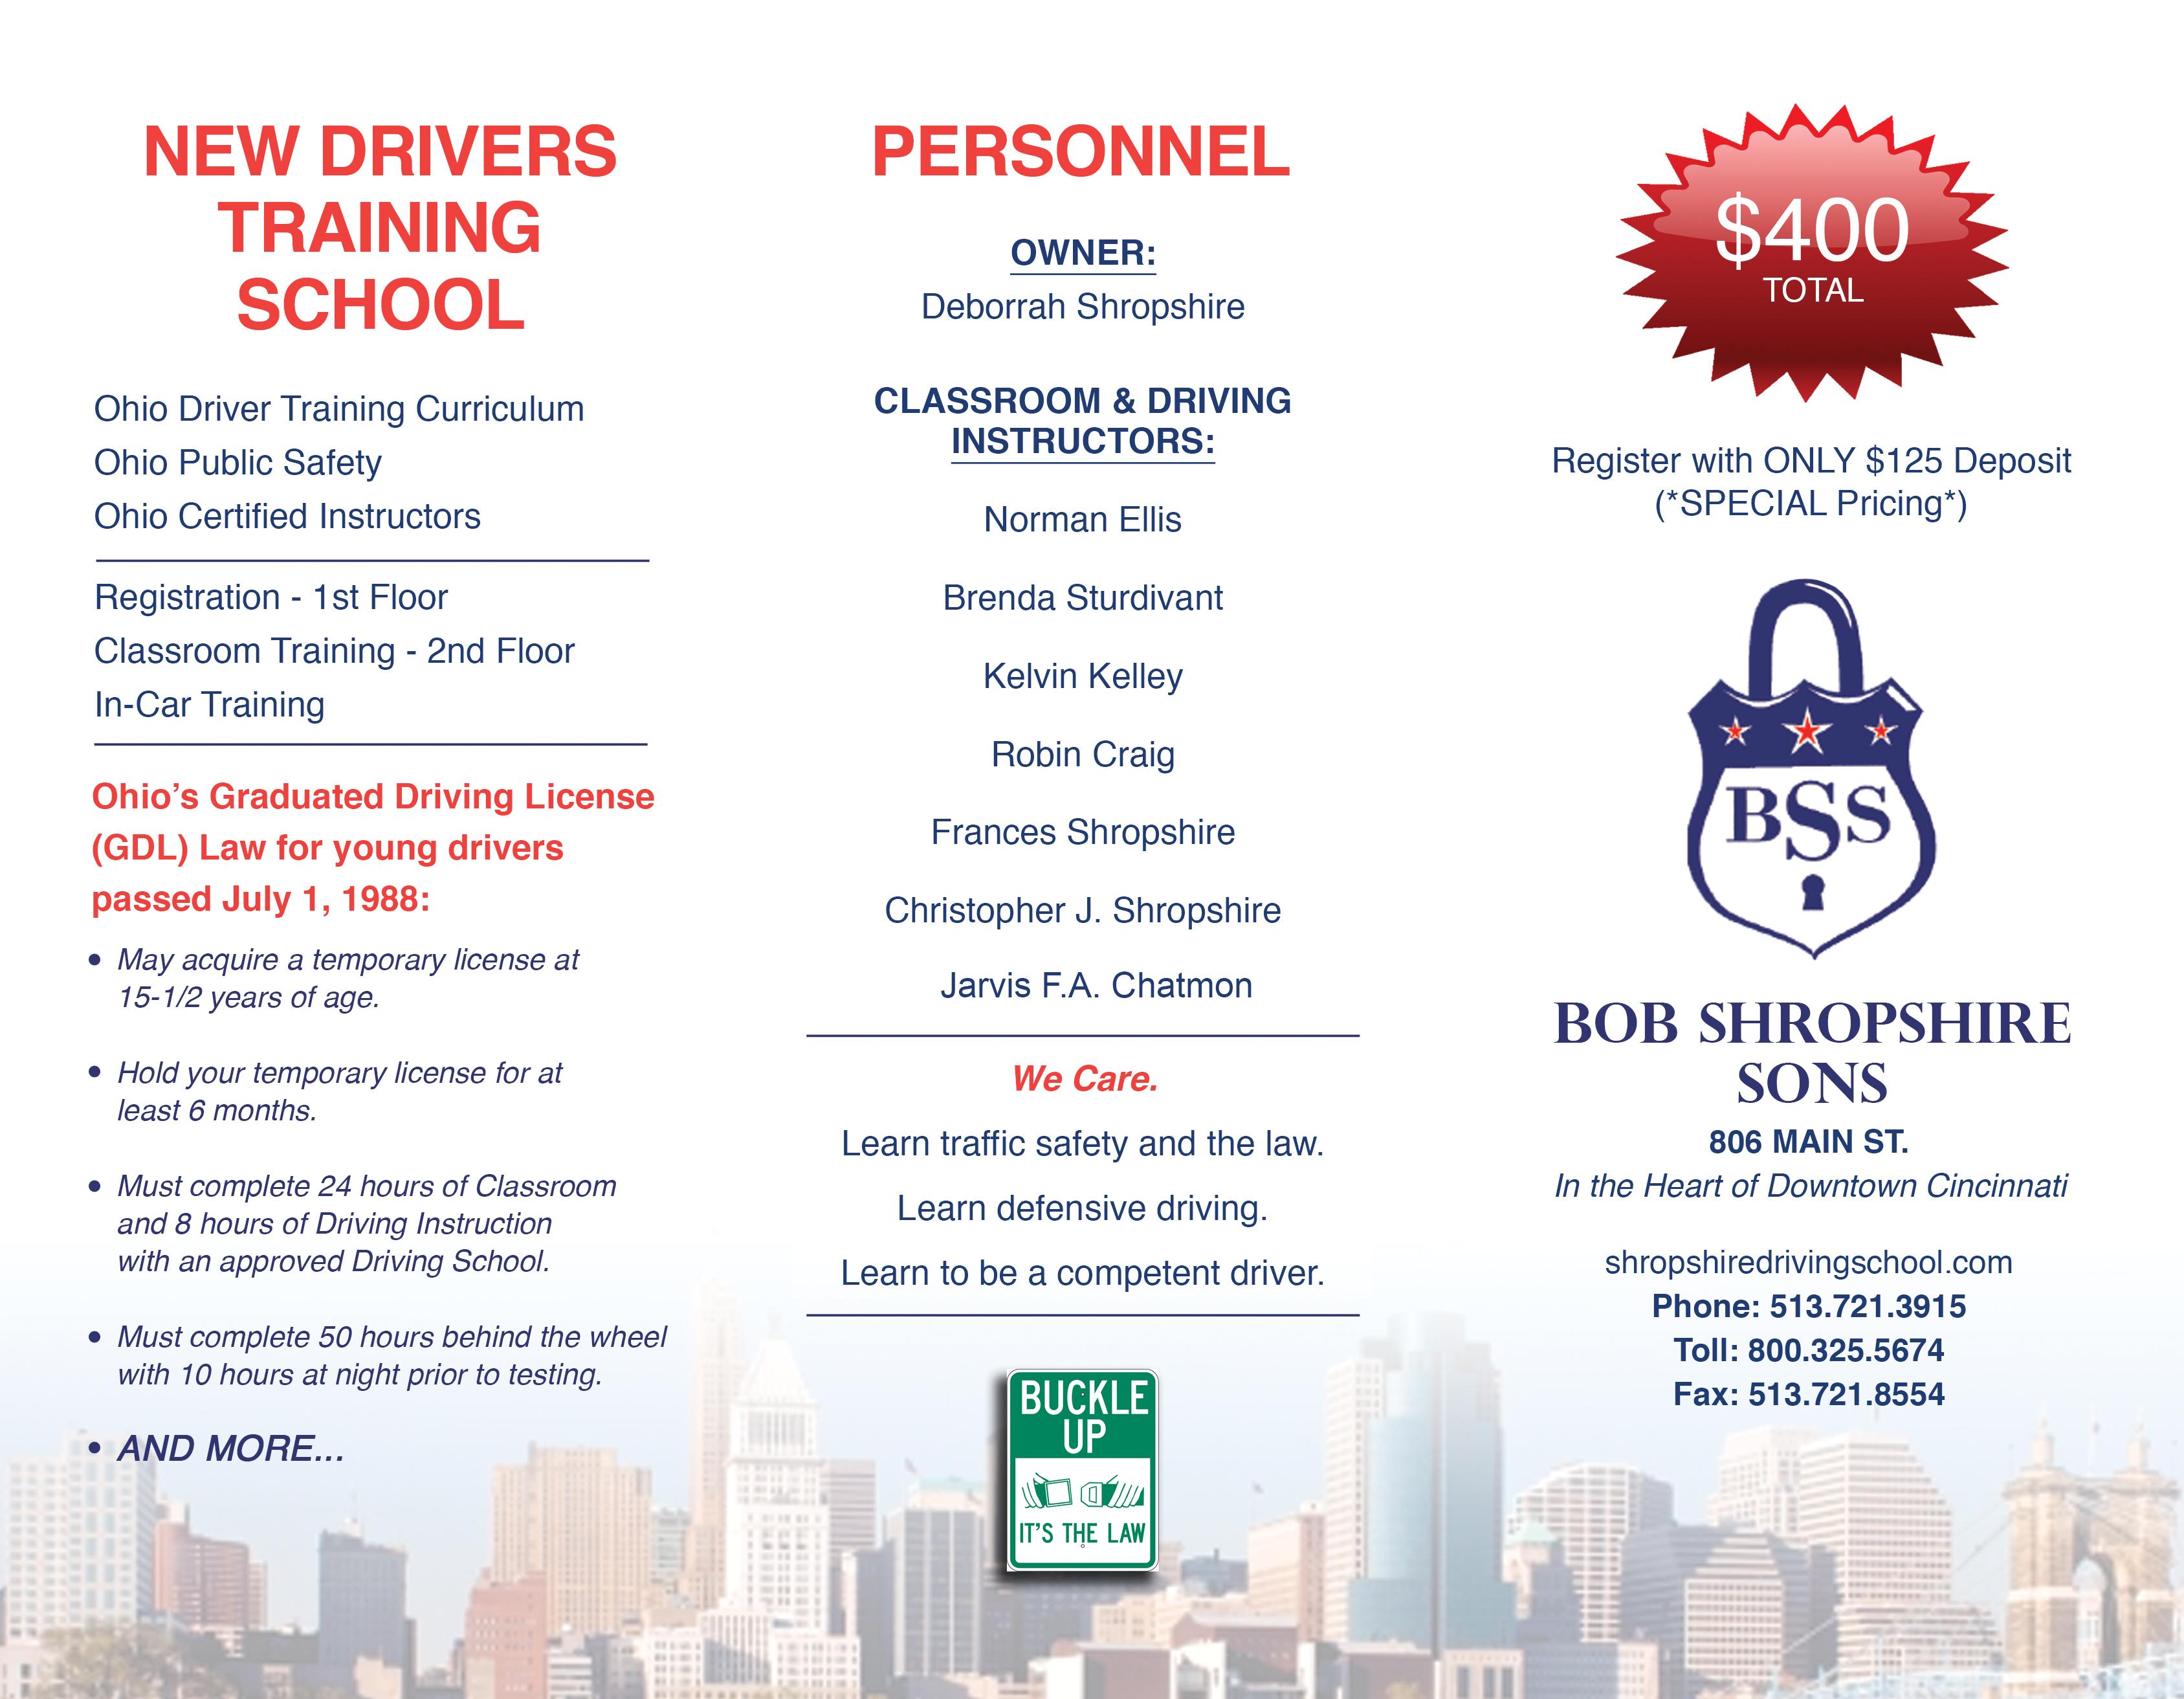 Bob Shropshire Driving School In Cincinnati Oh